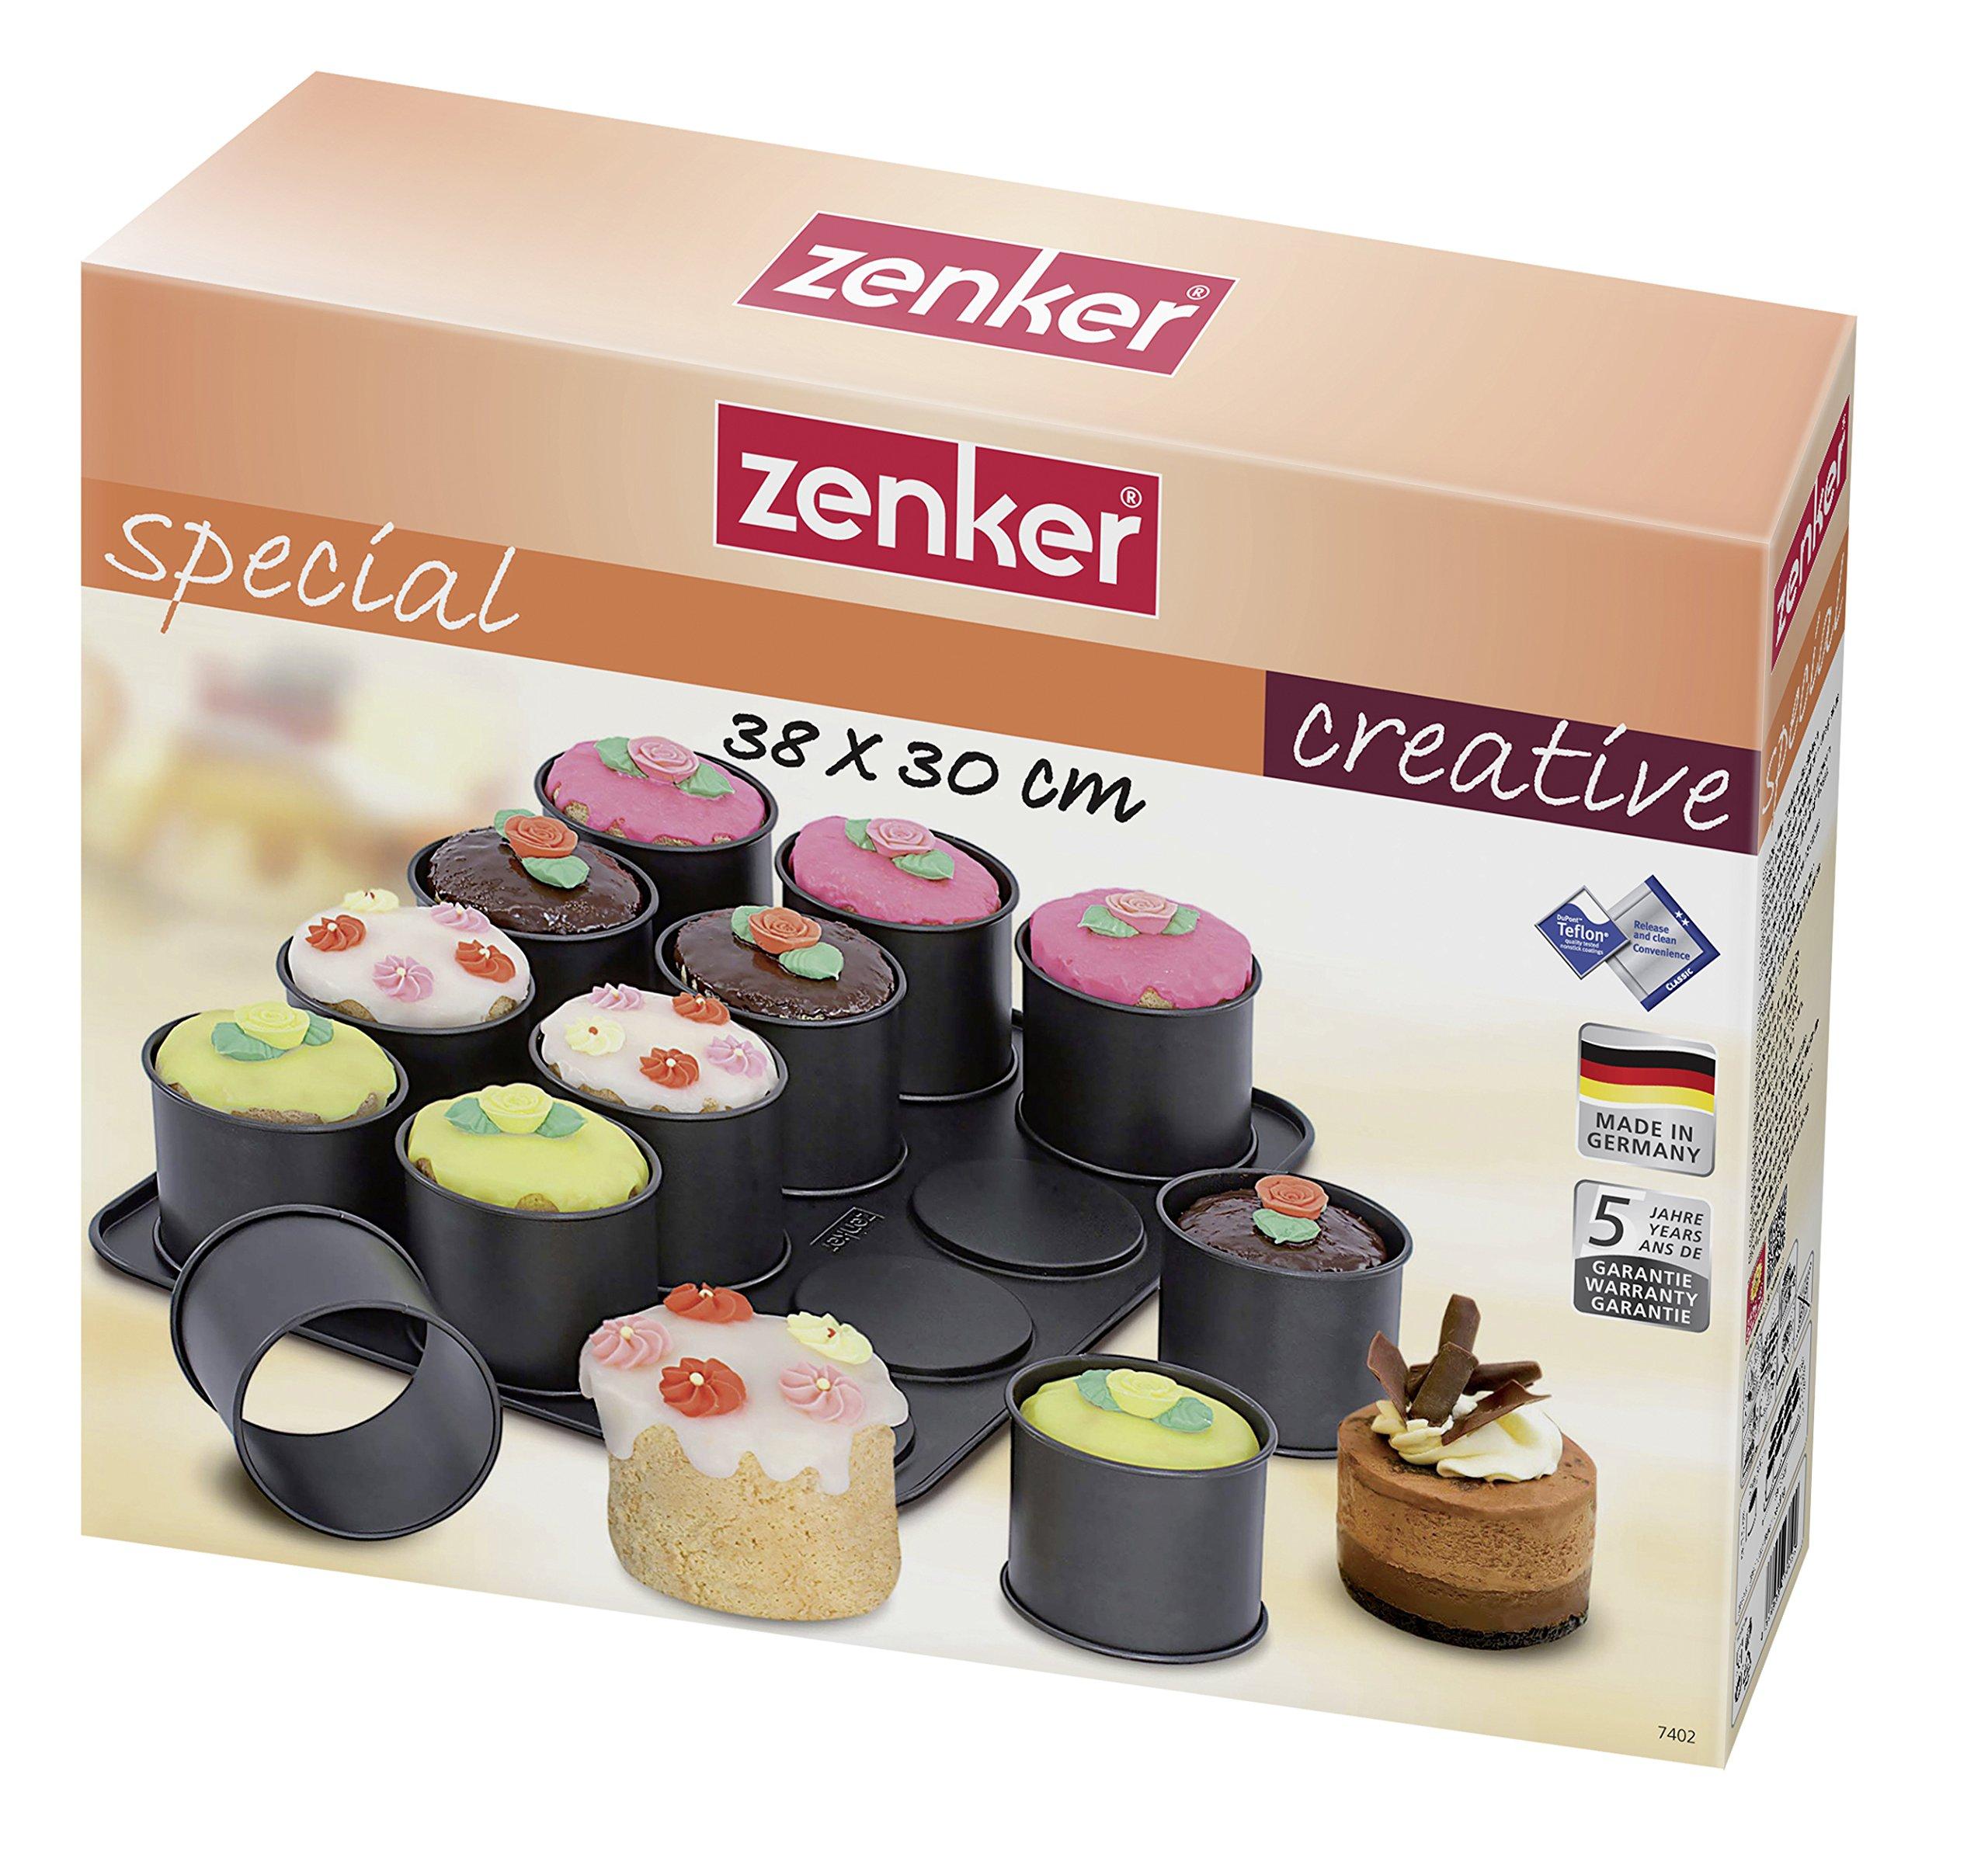 Zenker Ring Mold Creations, Nonstick by Zenker (Image #5)